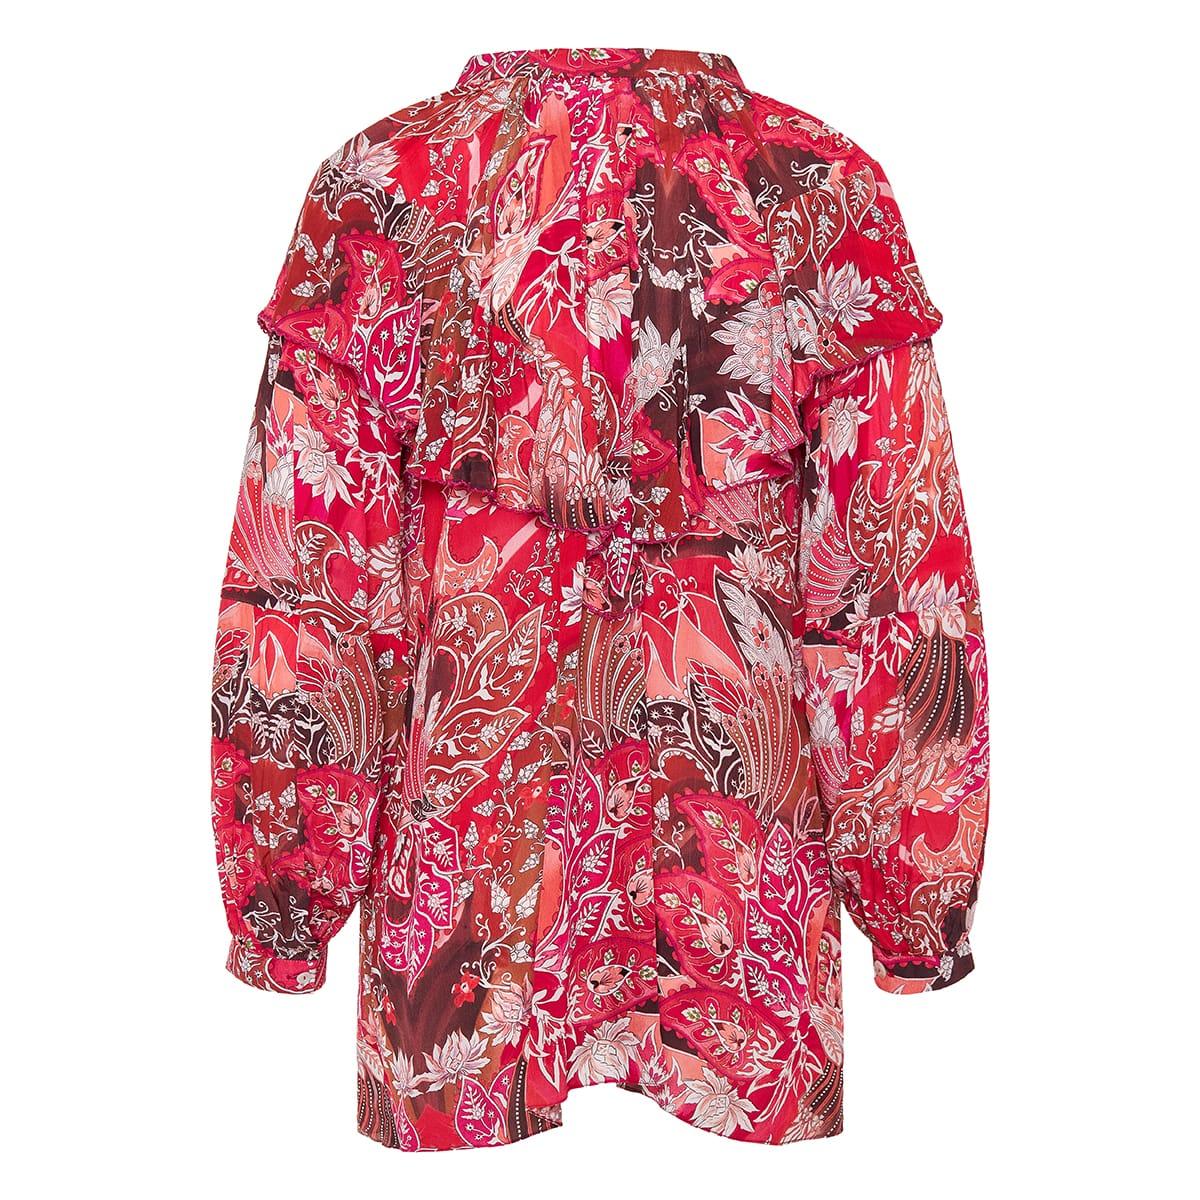 Moe ruffled printed blouse